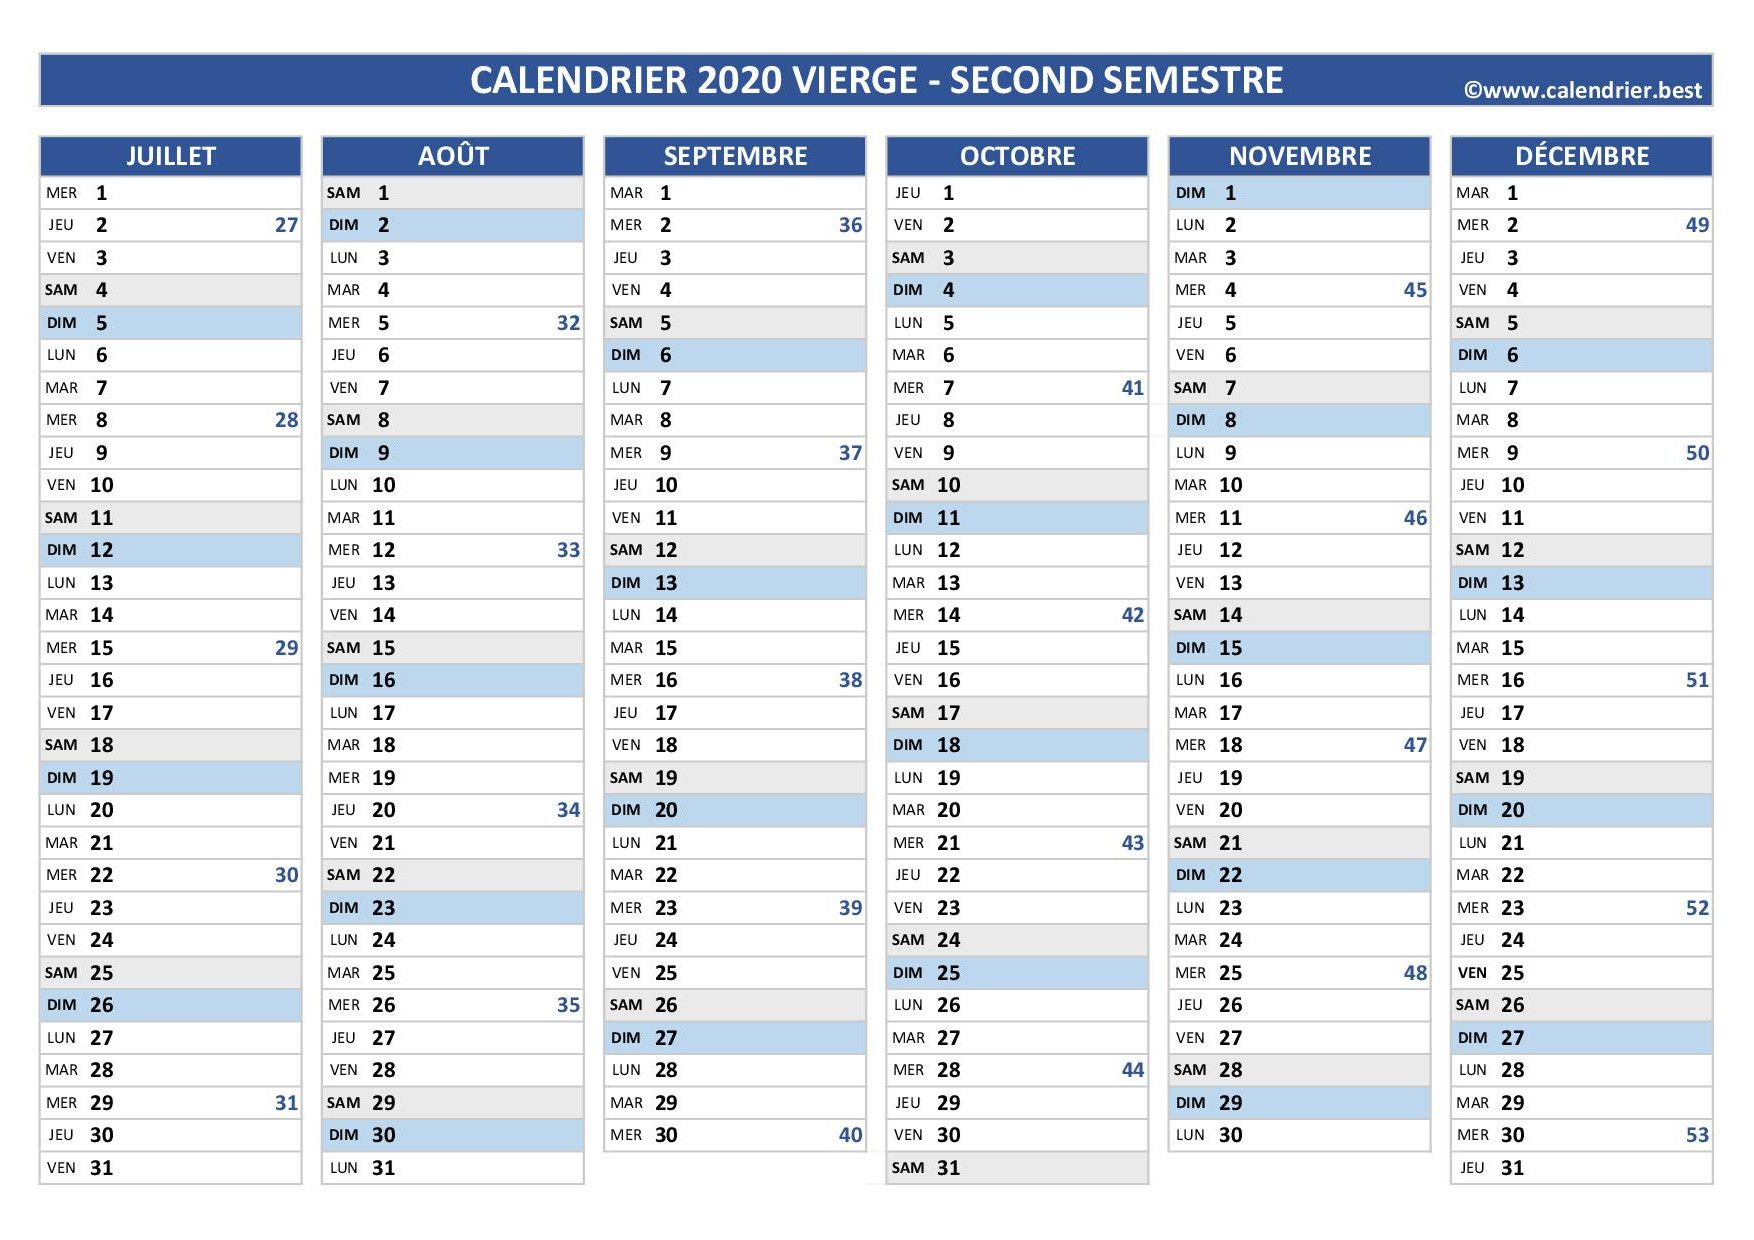 Calendrier 2020 vierge, 2nd semestre en 2020 | Calendrier vierge